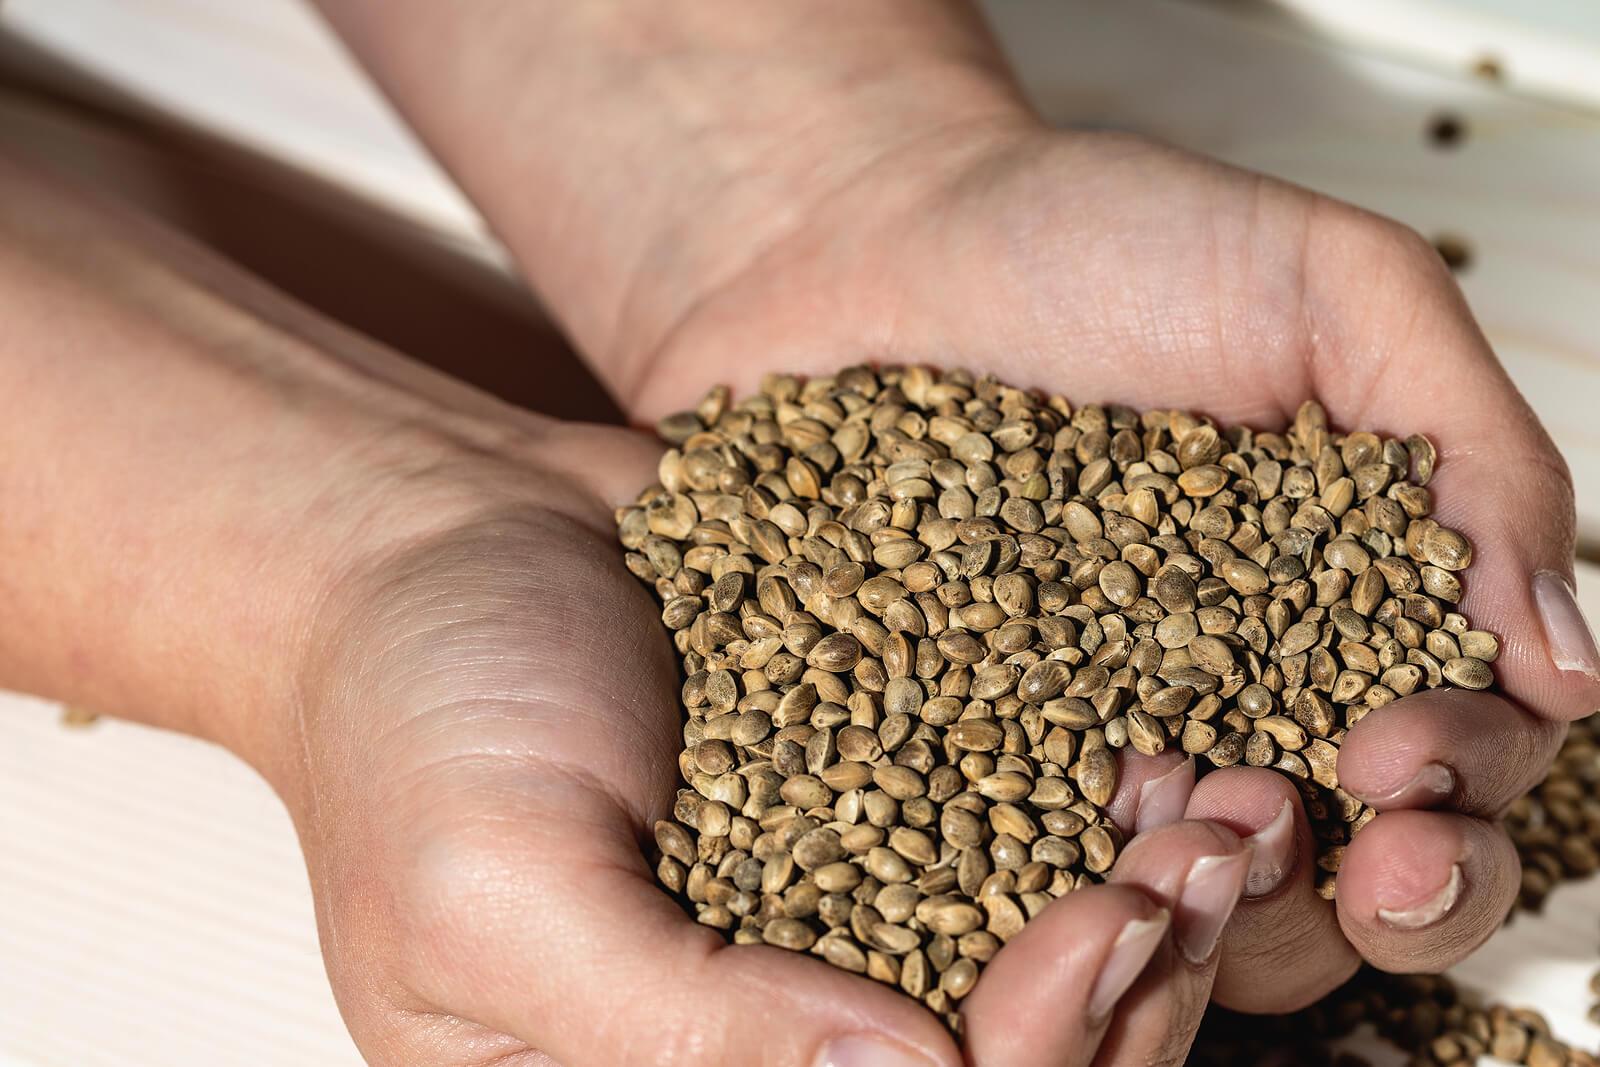 Buy Marijuana Seeds In Casas Adobes